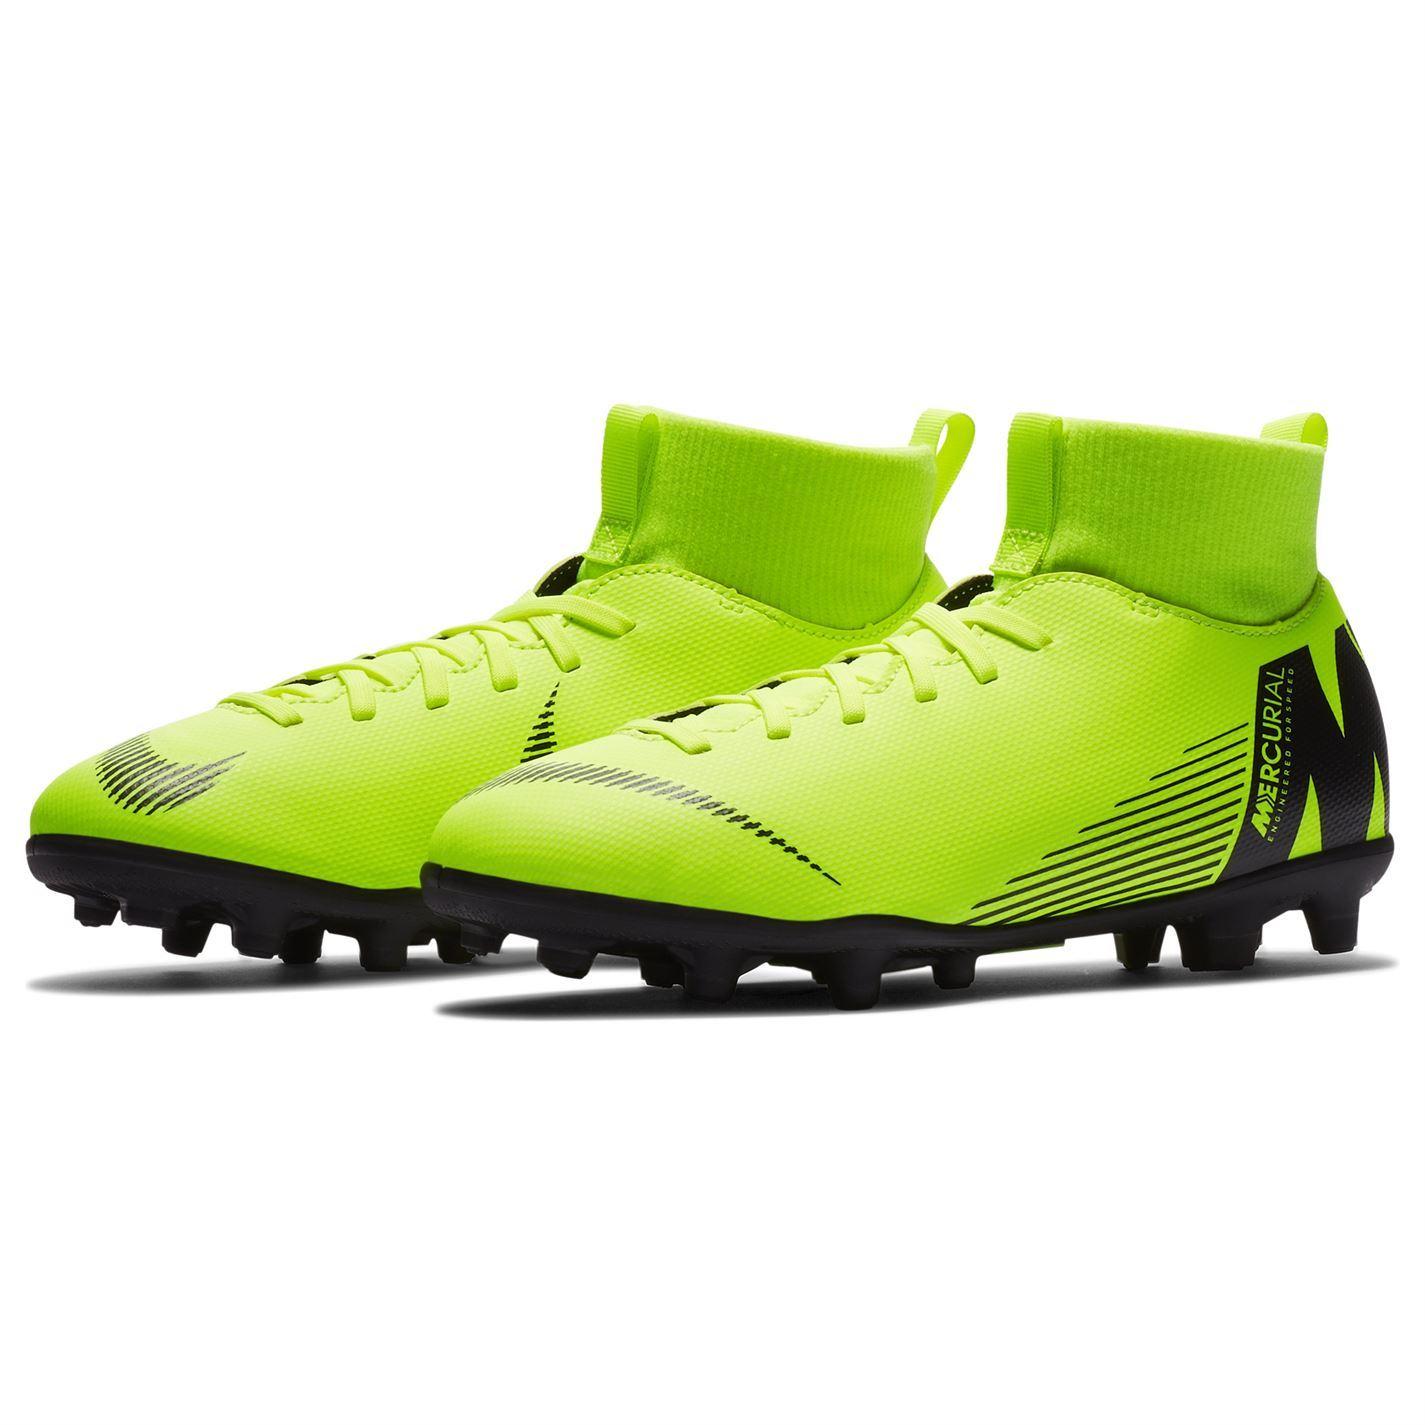 Nike-MERCURIAL-SUPERFLY-Club-DF-TERRA-FERMA-SCARPE-DA-CALCIO-JUNIOR-CALCIO-Cunei miniatura 15